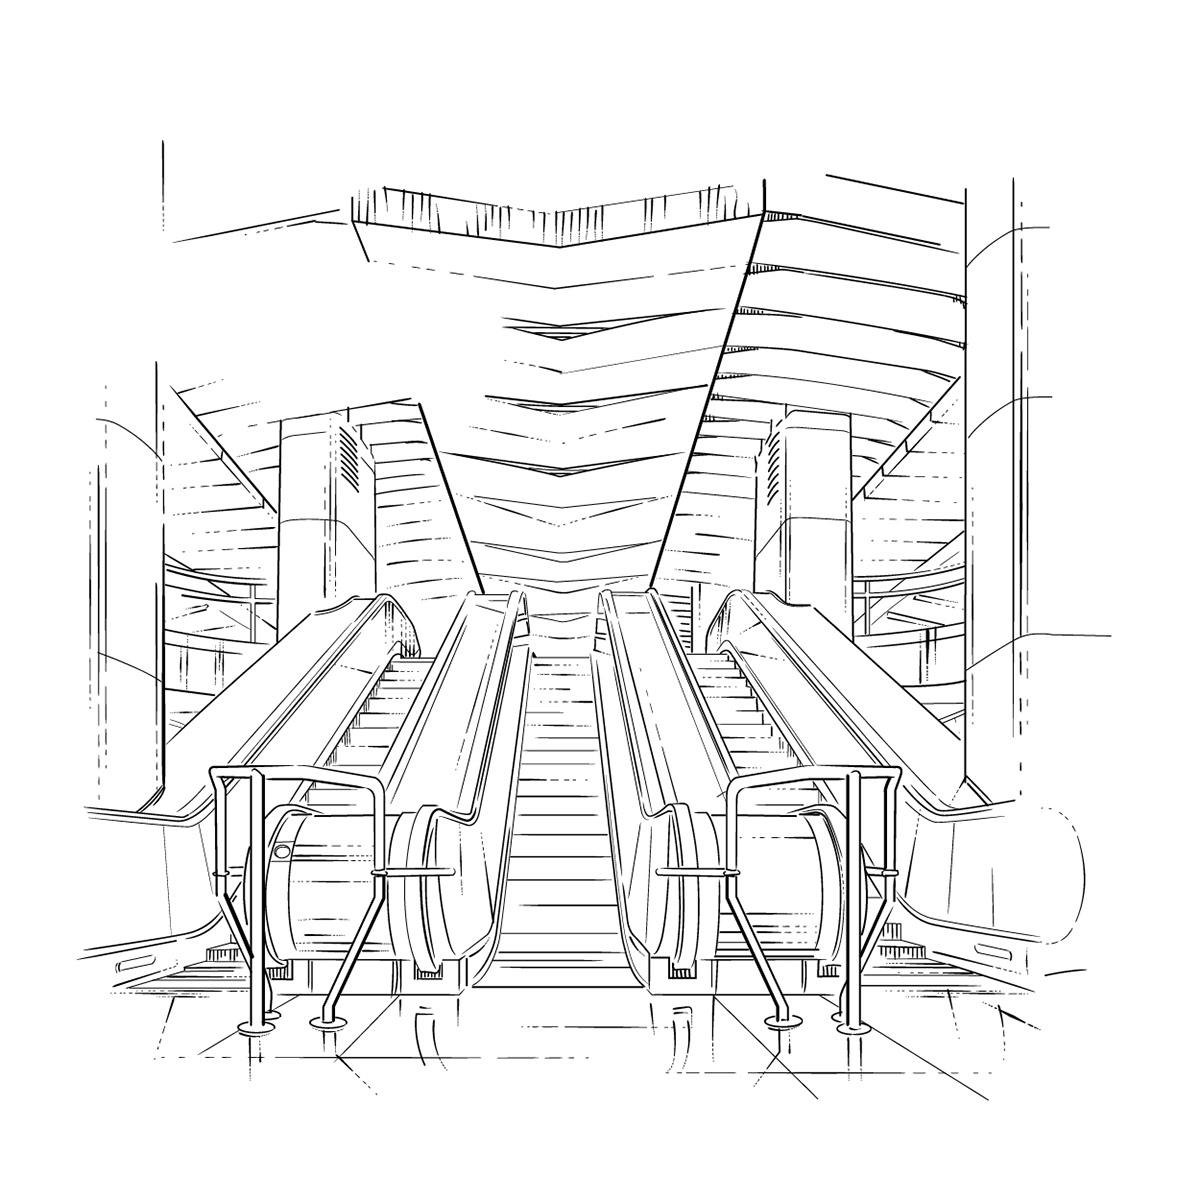 architecture moscowmetro illistration picomaticagency orderillustration moscowartist